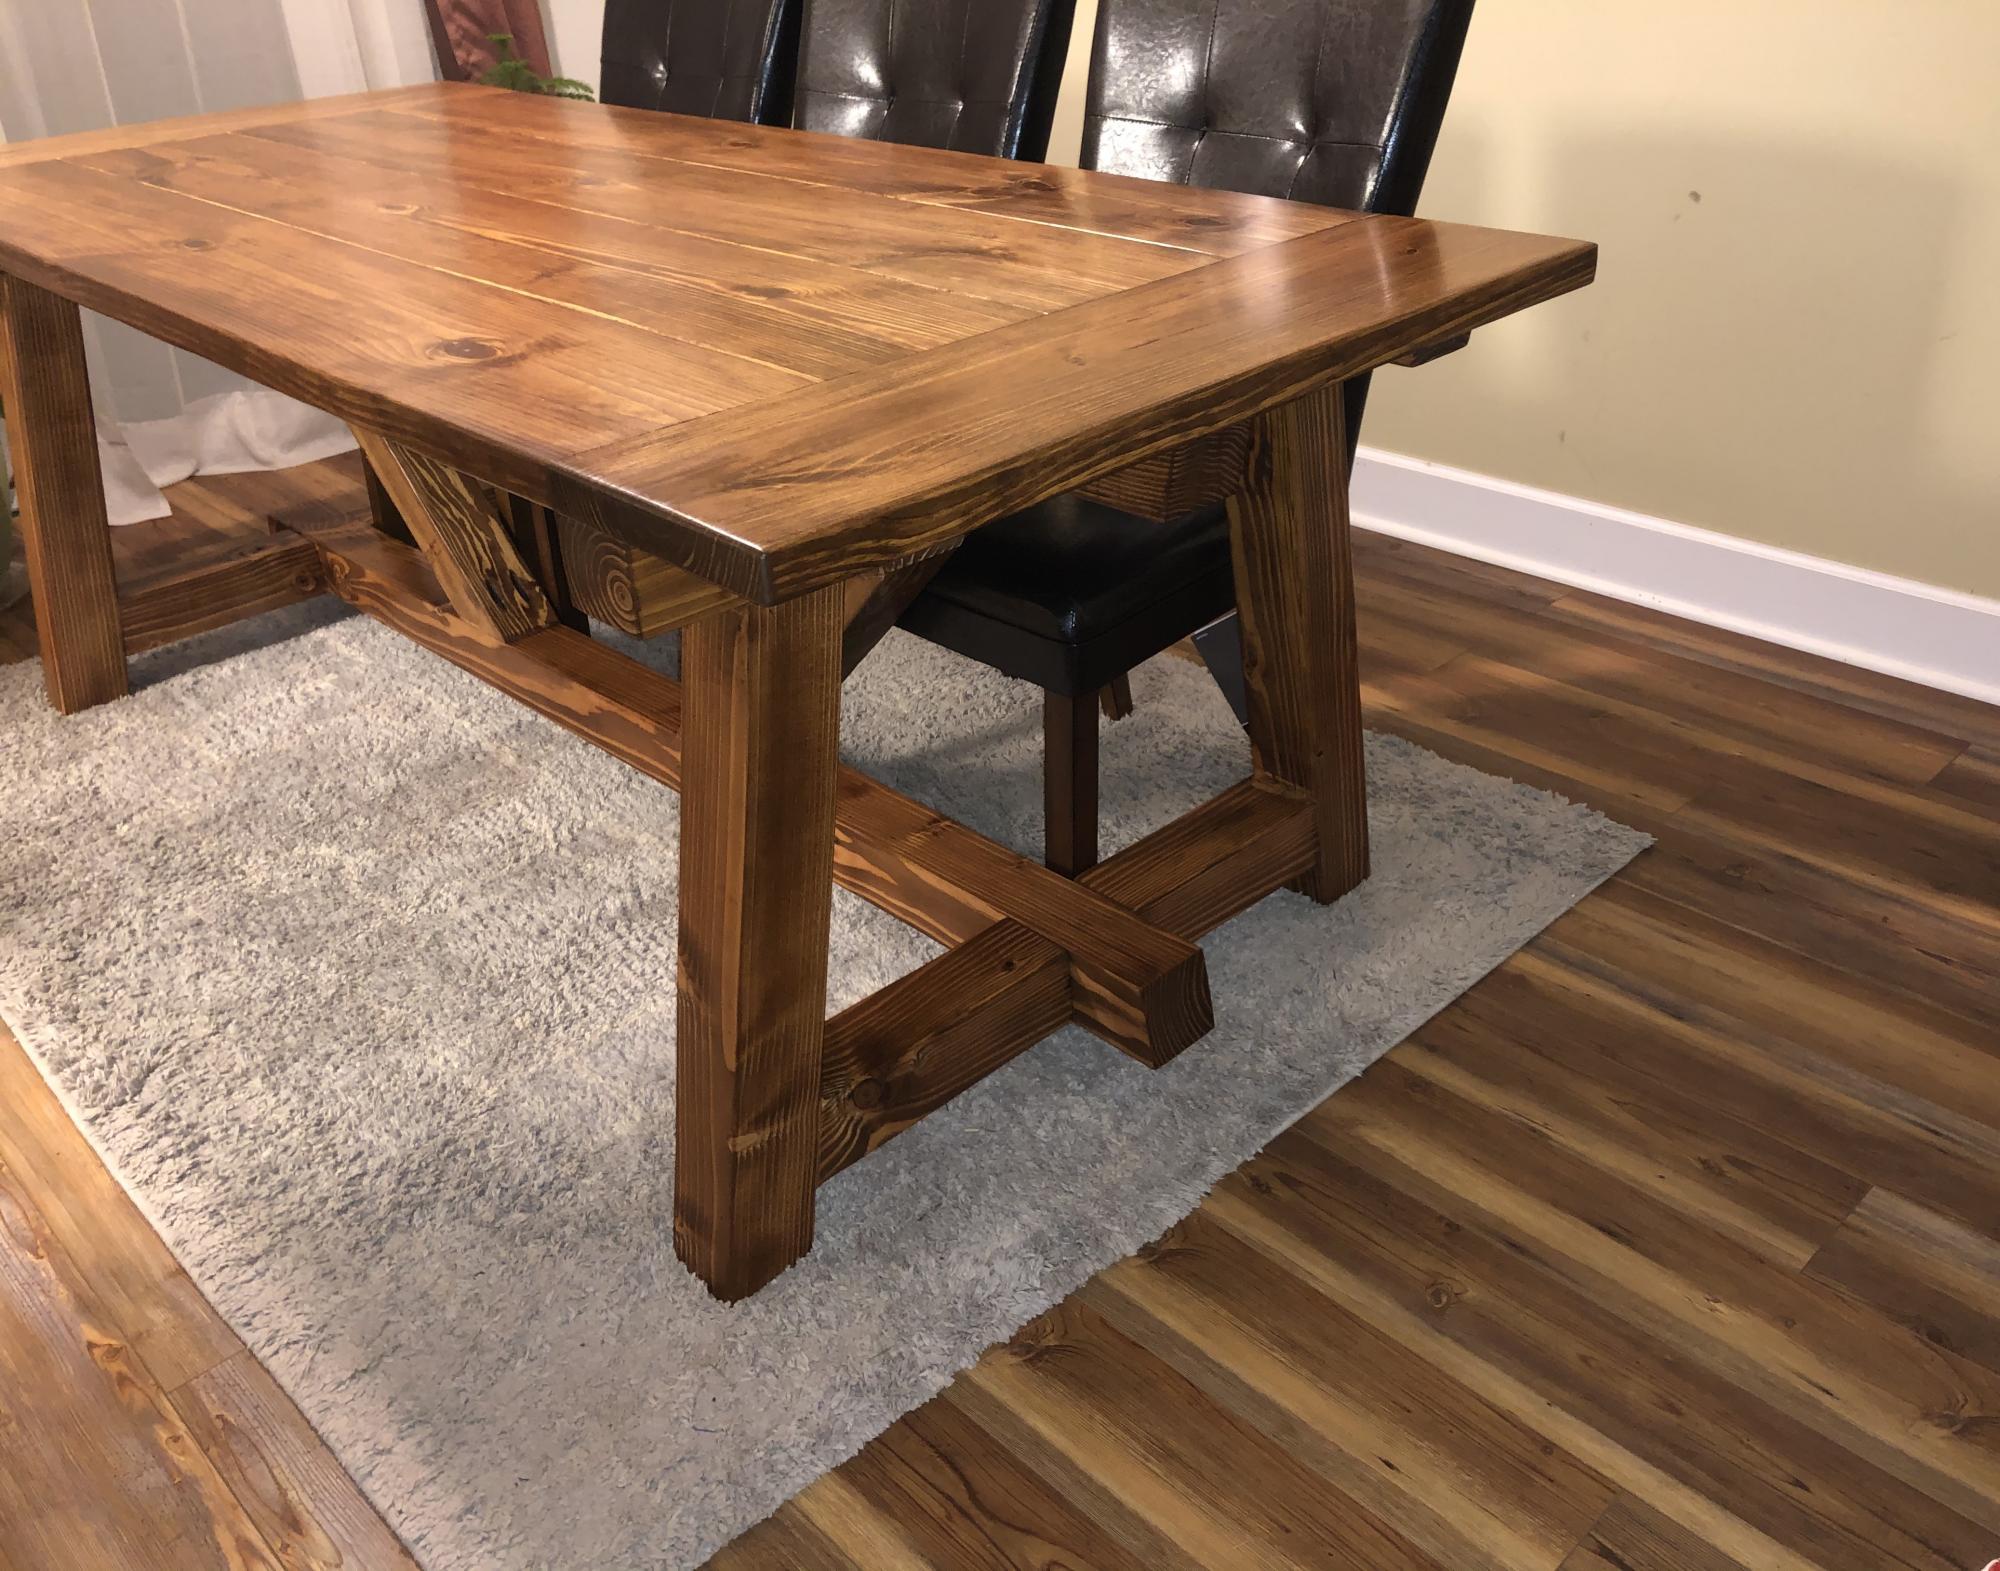 4x4 Farm Table By Csg Ana White